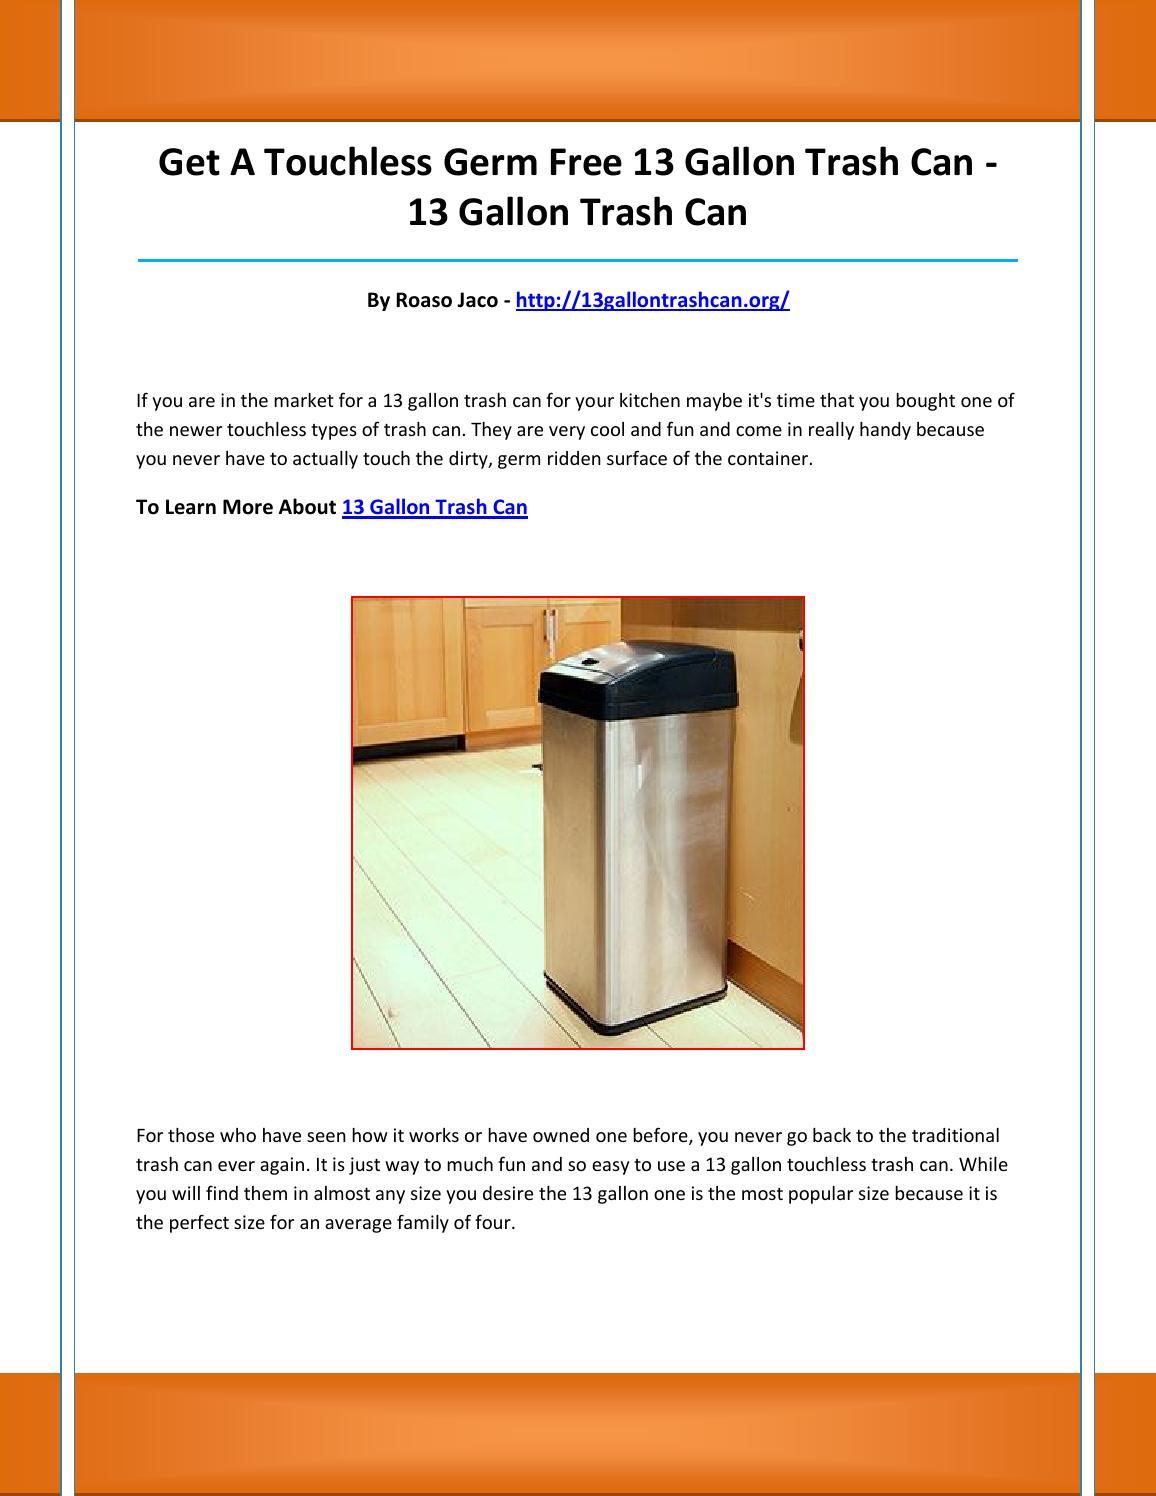 13 gallon trash can by faosdfndoe - issuu